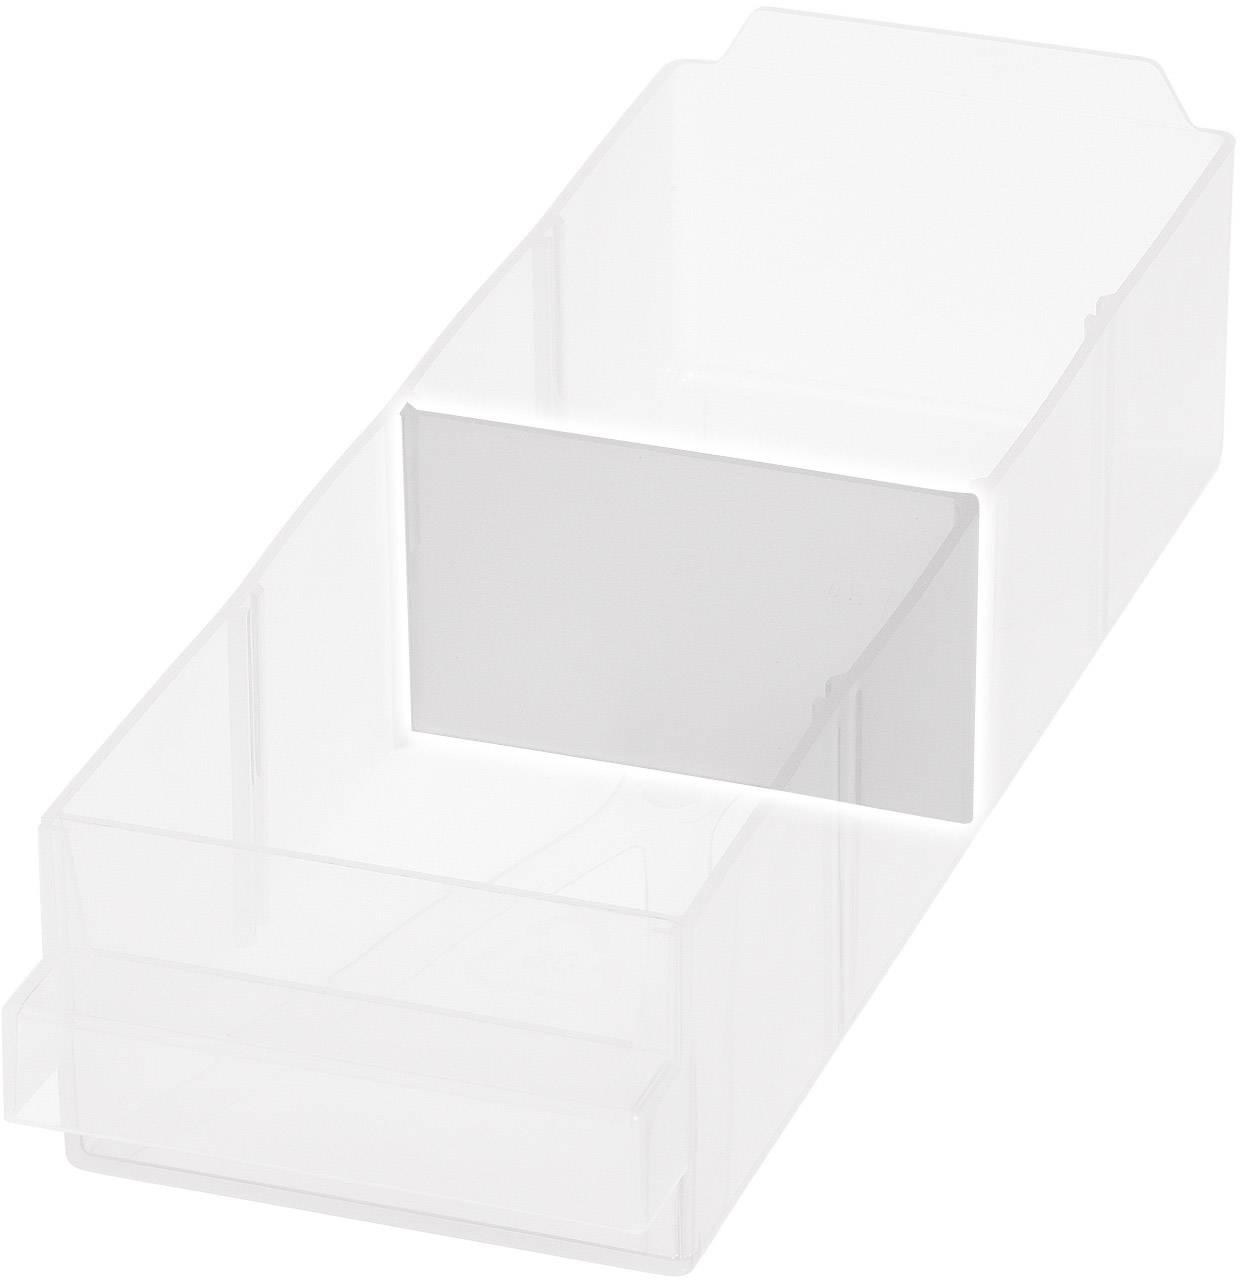 raaco 250-01 razdelilna stena za predalnik (Š x V x G) 75 x 46 x 3.2 mm    36 kos